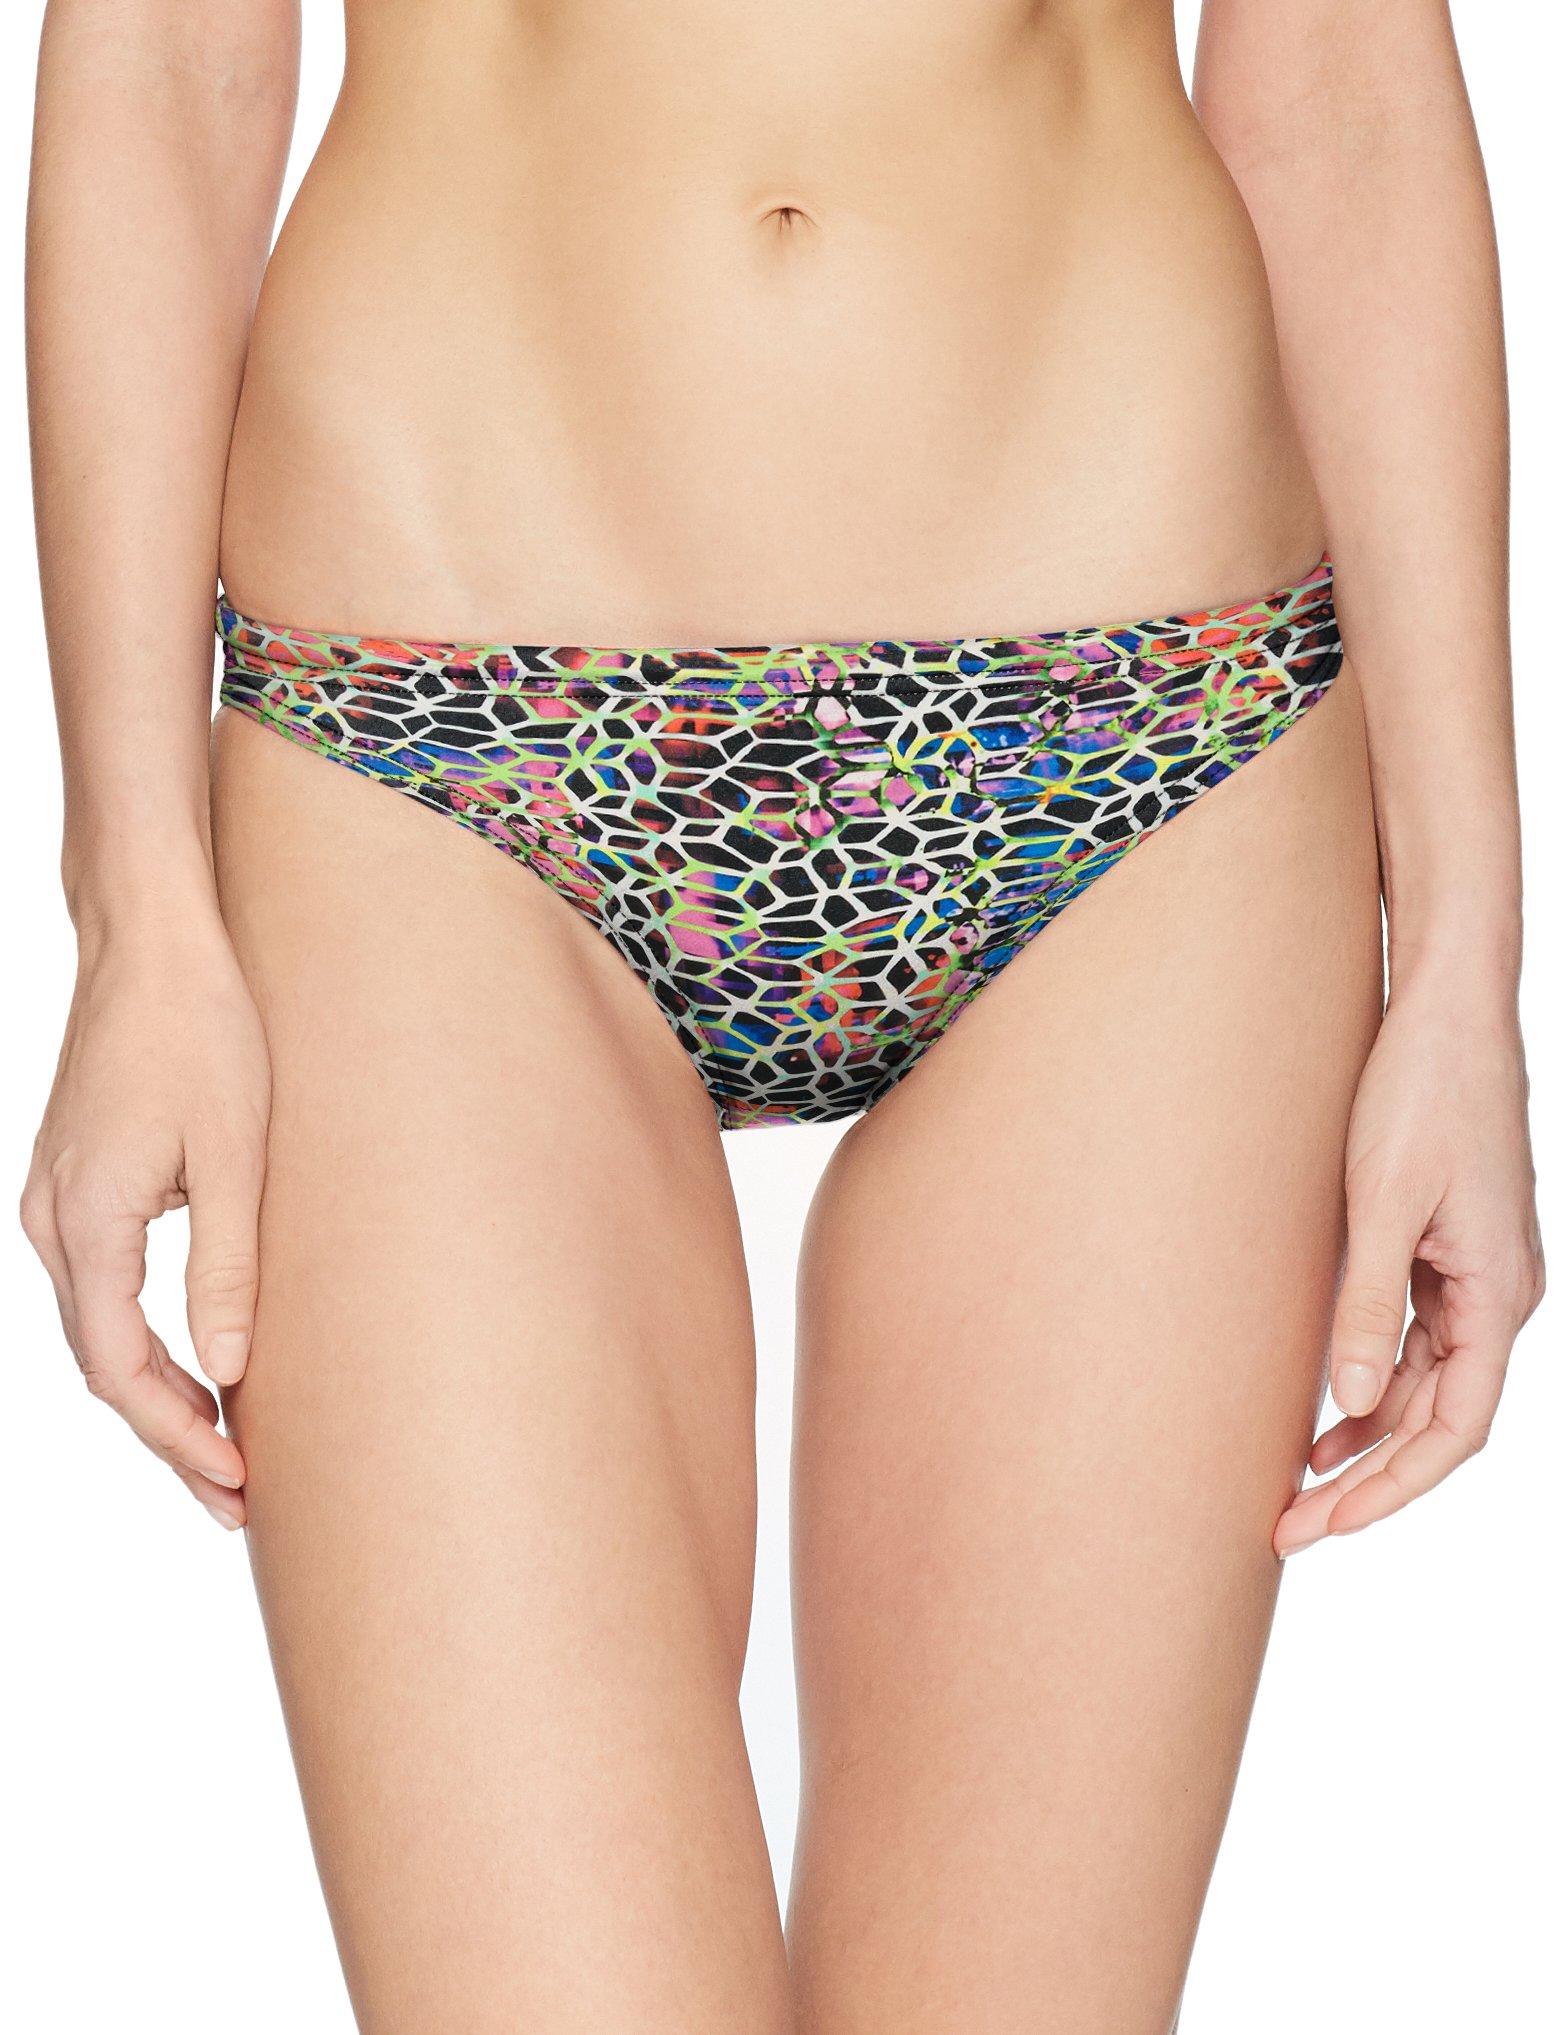 Arena Rulebreaker Real Bikini Bottom, Black Multi-Yellow Star, X-Small by Arena